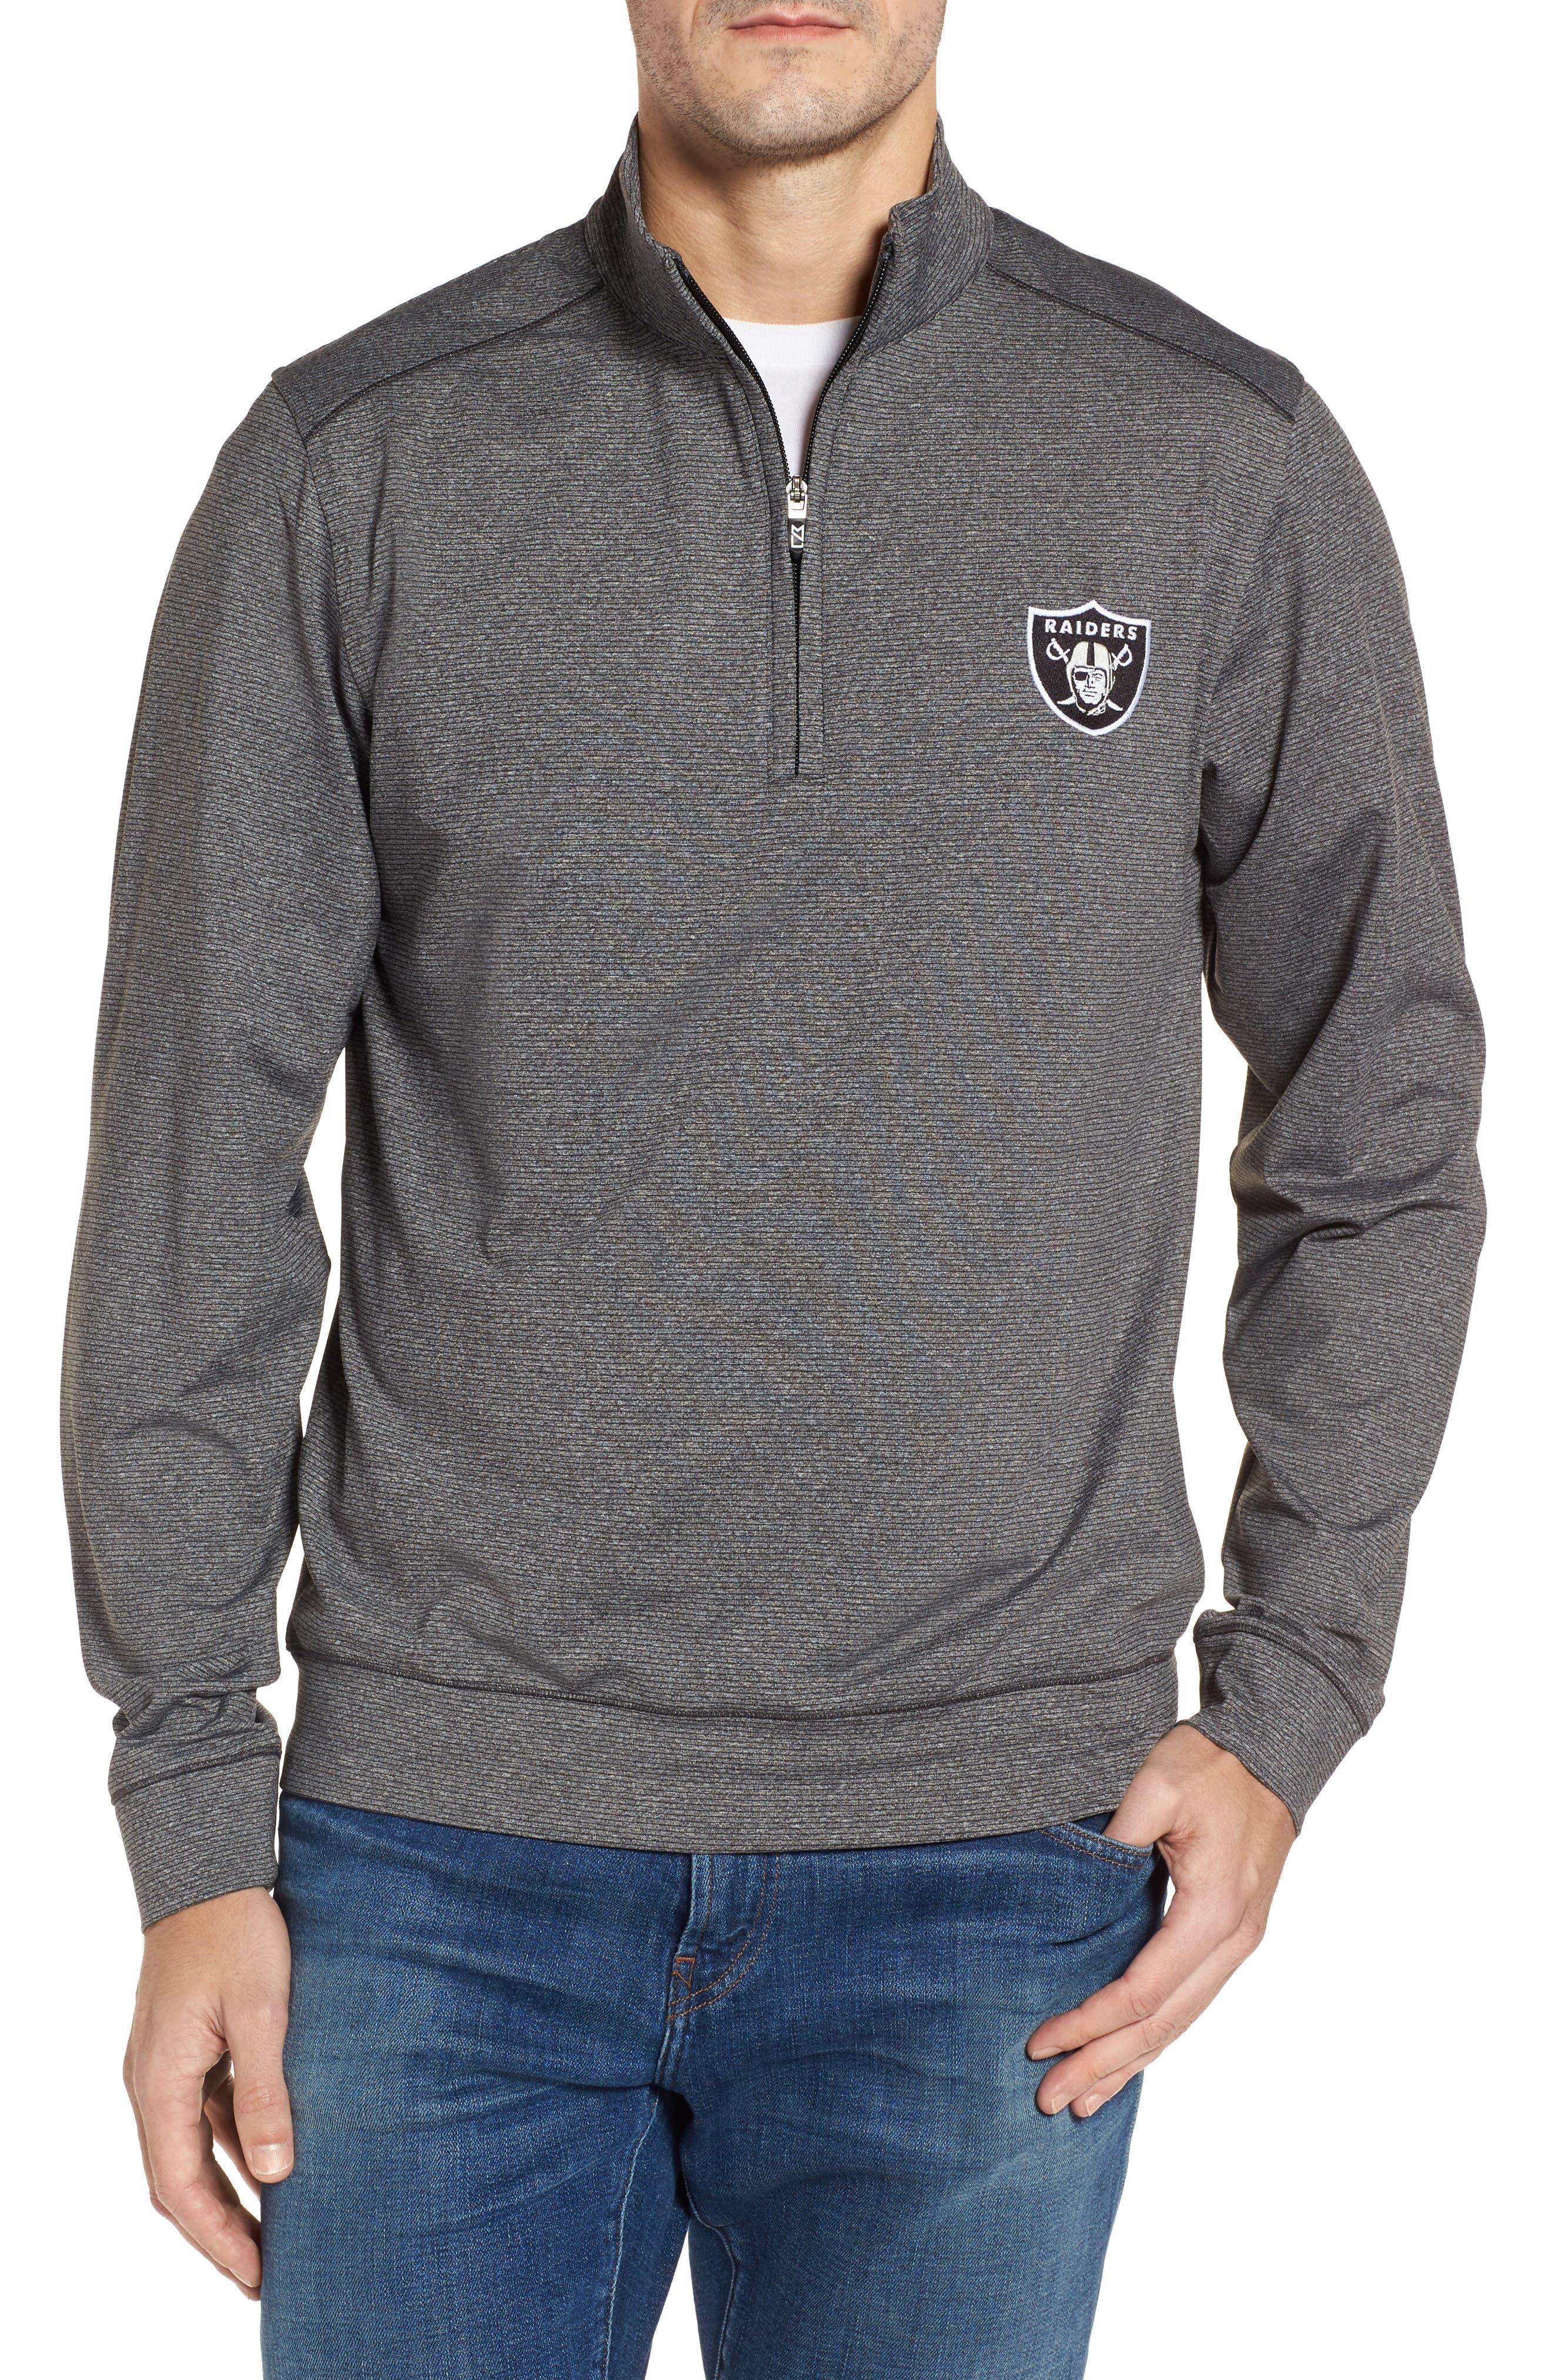 Alternate Image 1 Selected - Cutter & Buck Shoreline - Oakland Raiders Half Zip Pullover